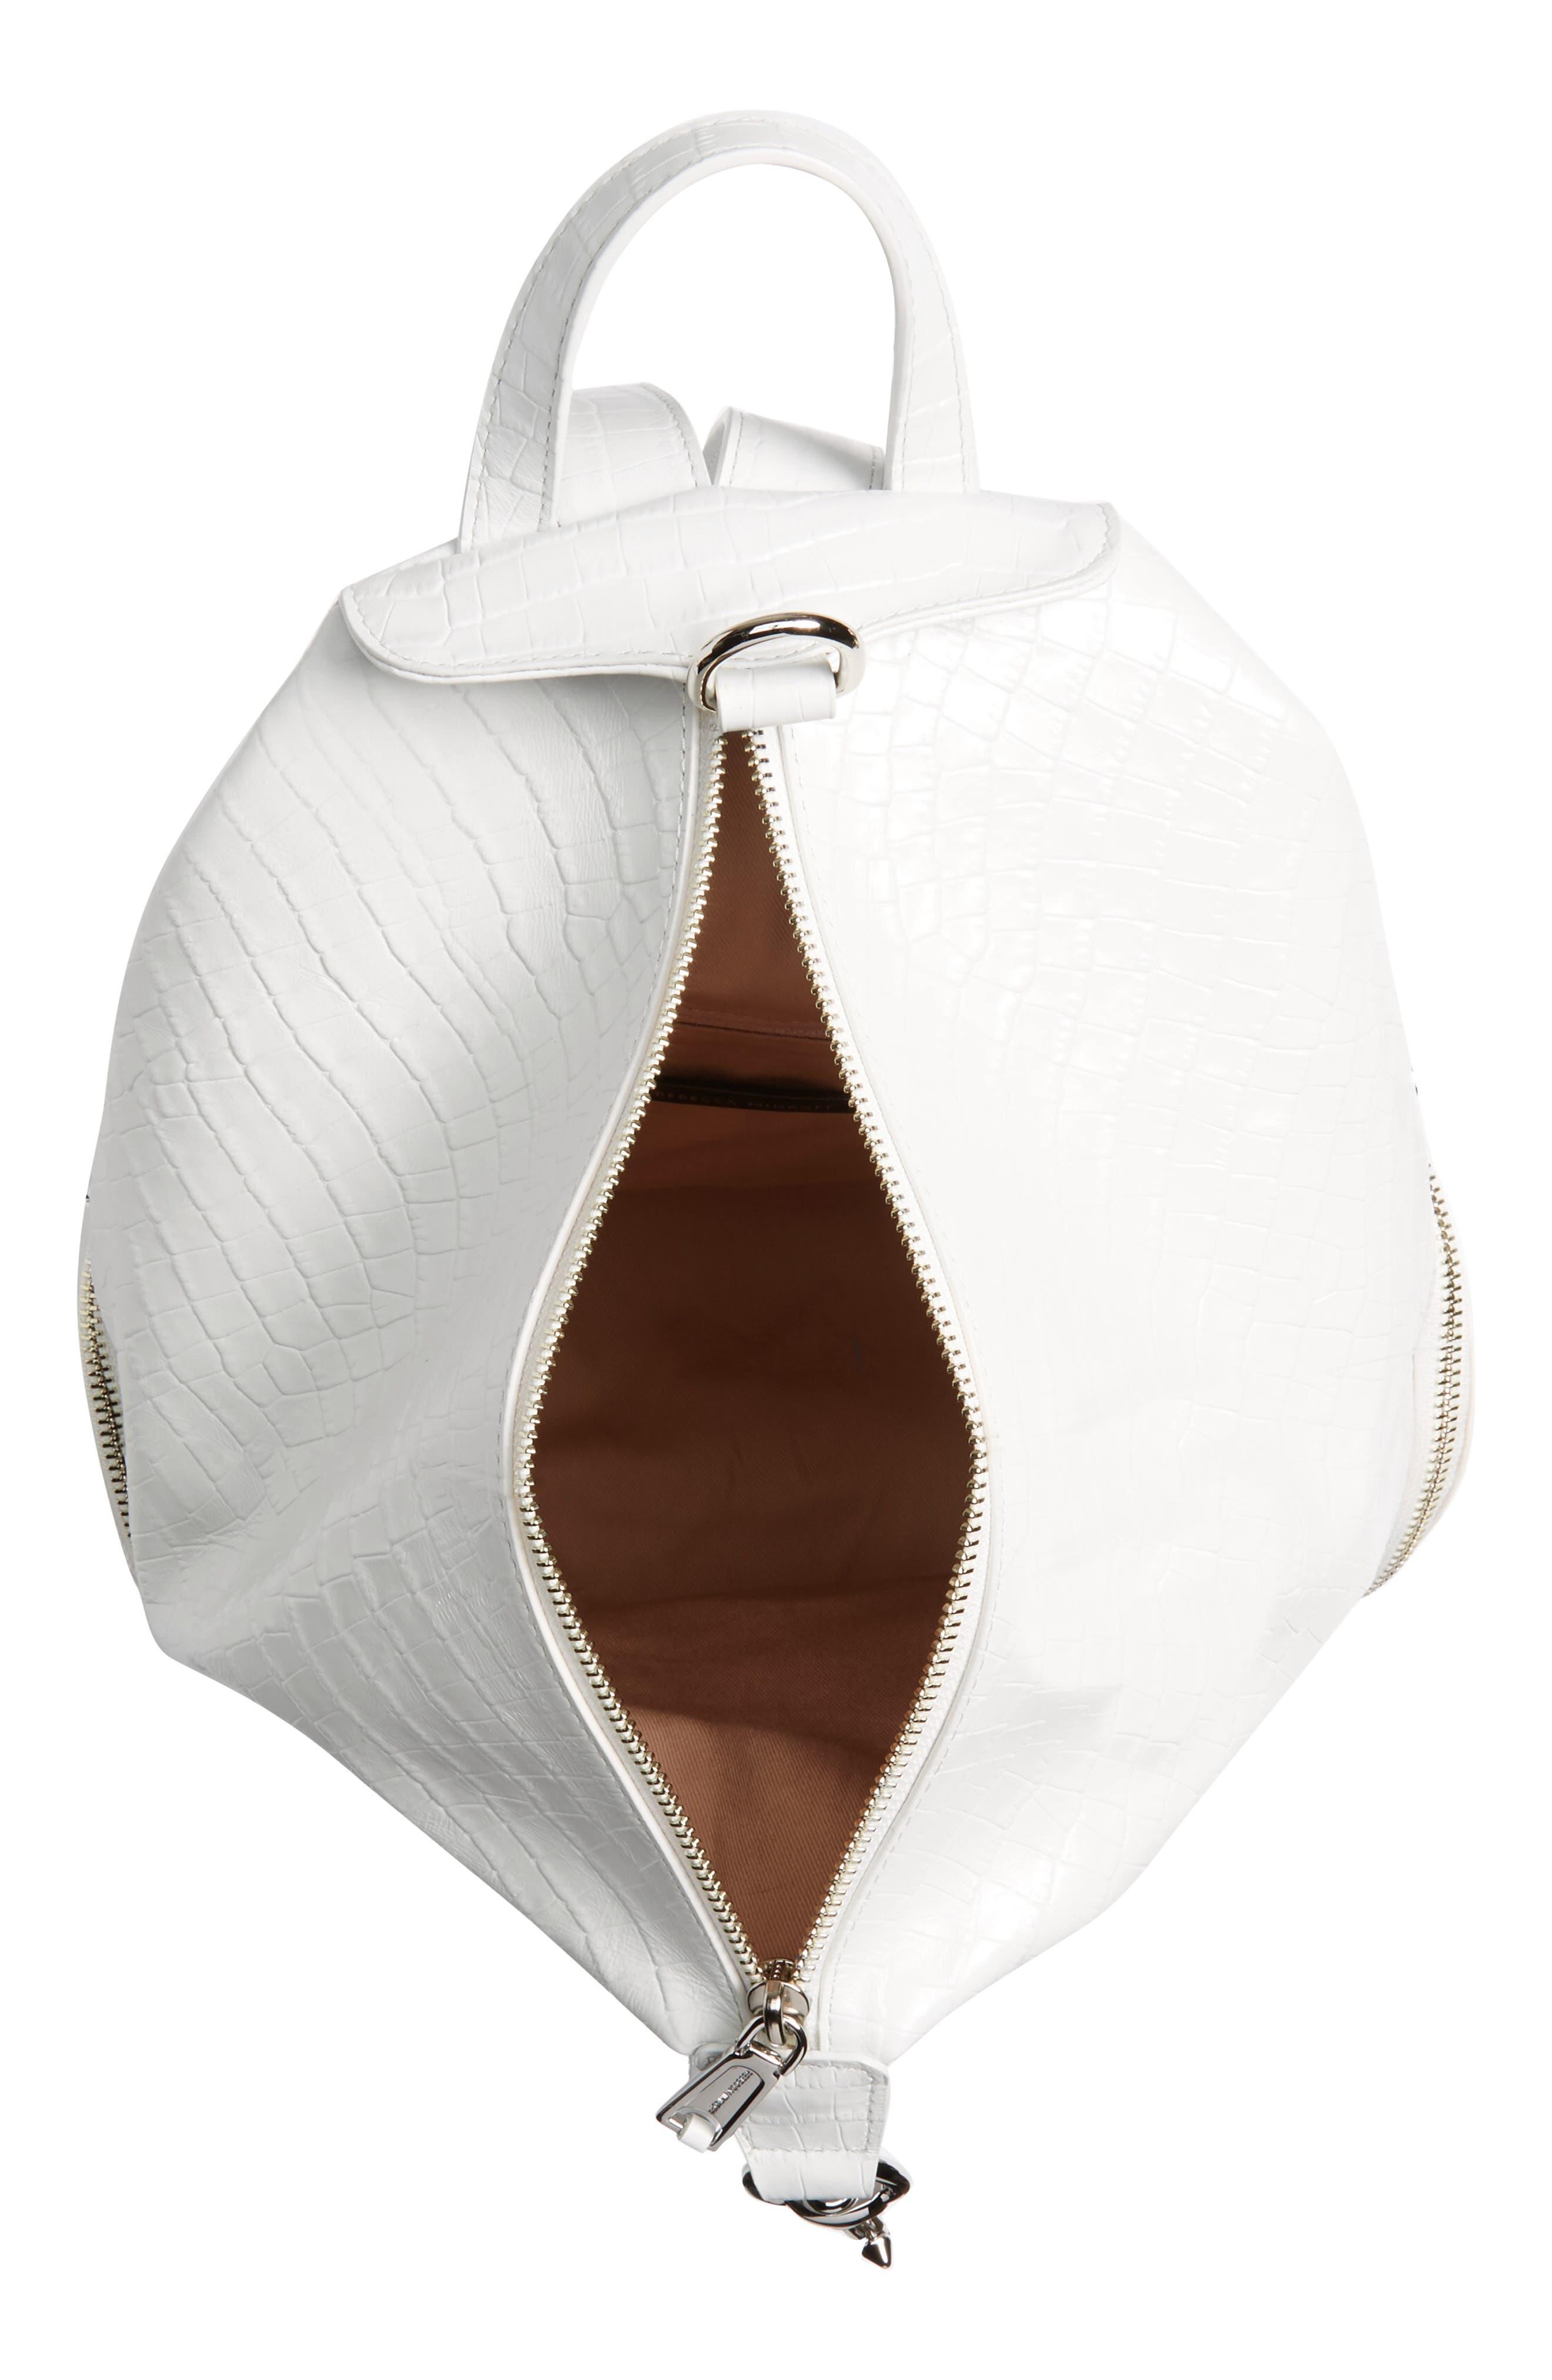 REBECCA MINKOFF, Julian Croc Embossed Leather Backpack, Alternate thumbnail 4, color, OPTIC WHITE